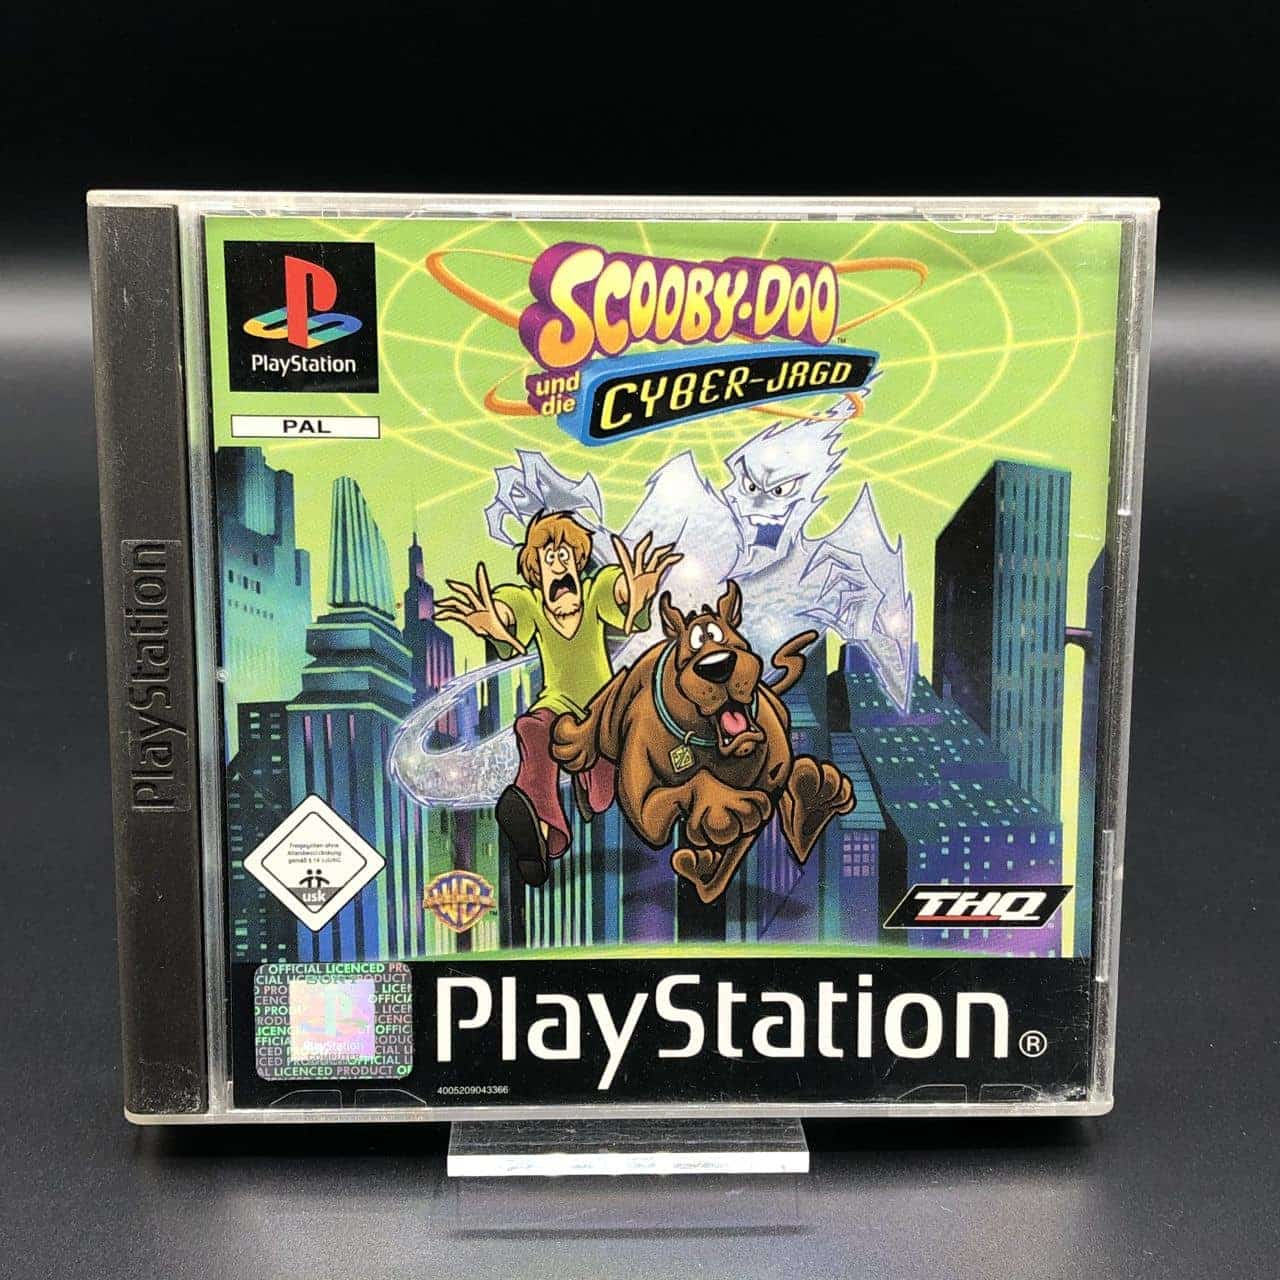 PS1 Scooby-Doo und die Cyber Jagd (Komplett) (Gut) Sony PlayStation 1